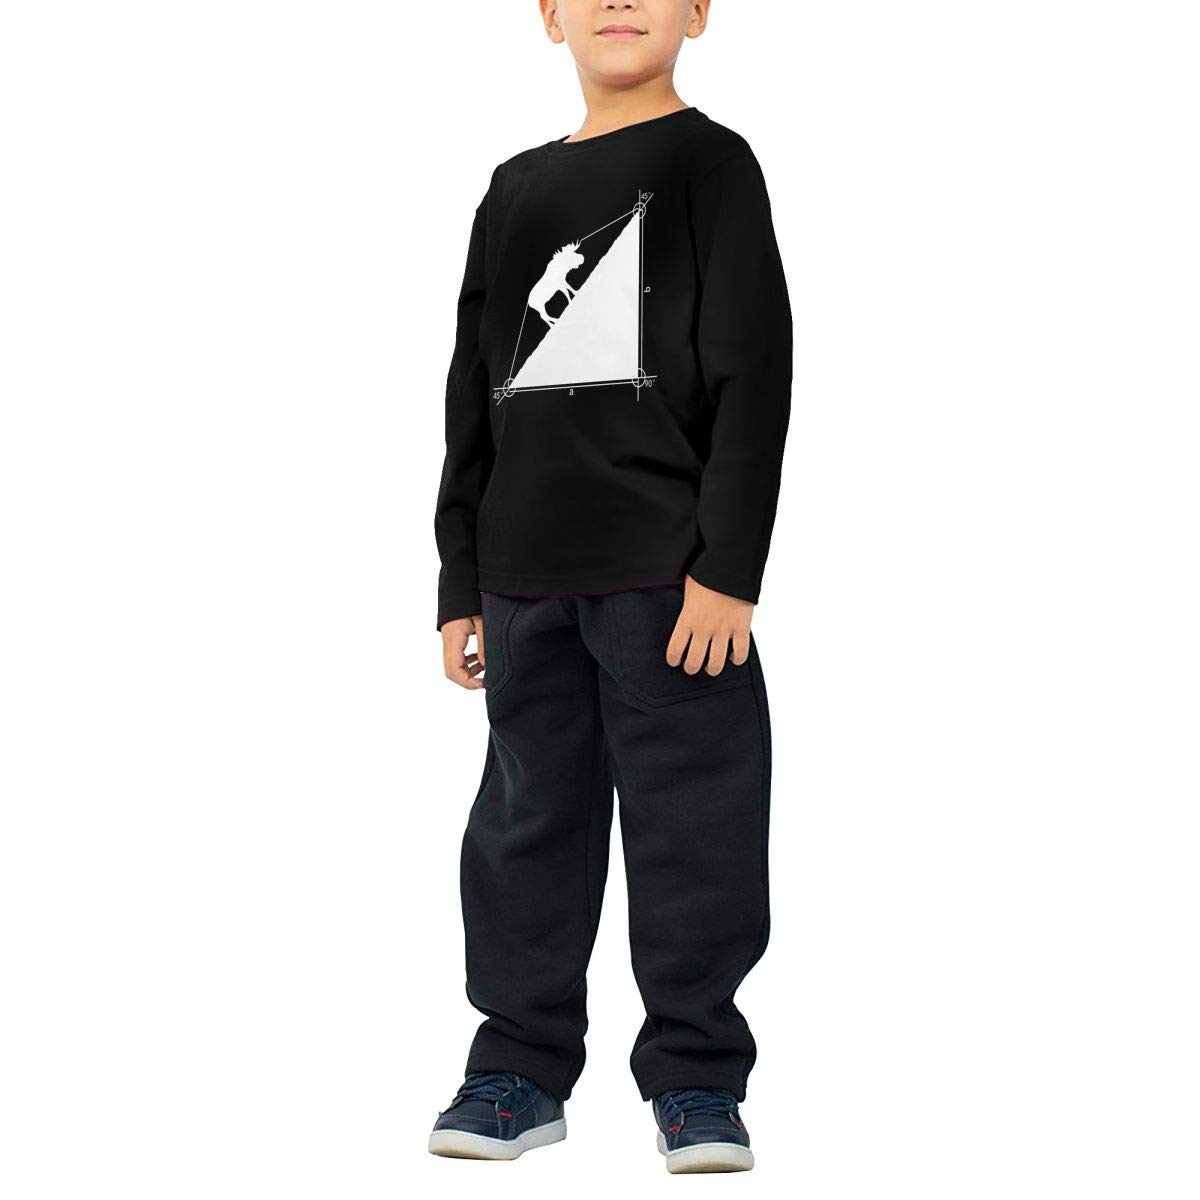 CERTONGCXTS Baby Girls Little Boys Funny Moose ComfortSoft Long Sleeve T-Shirt